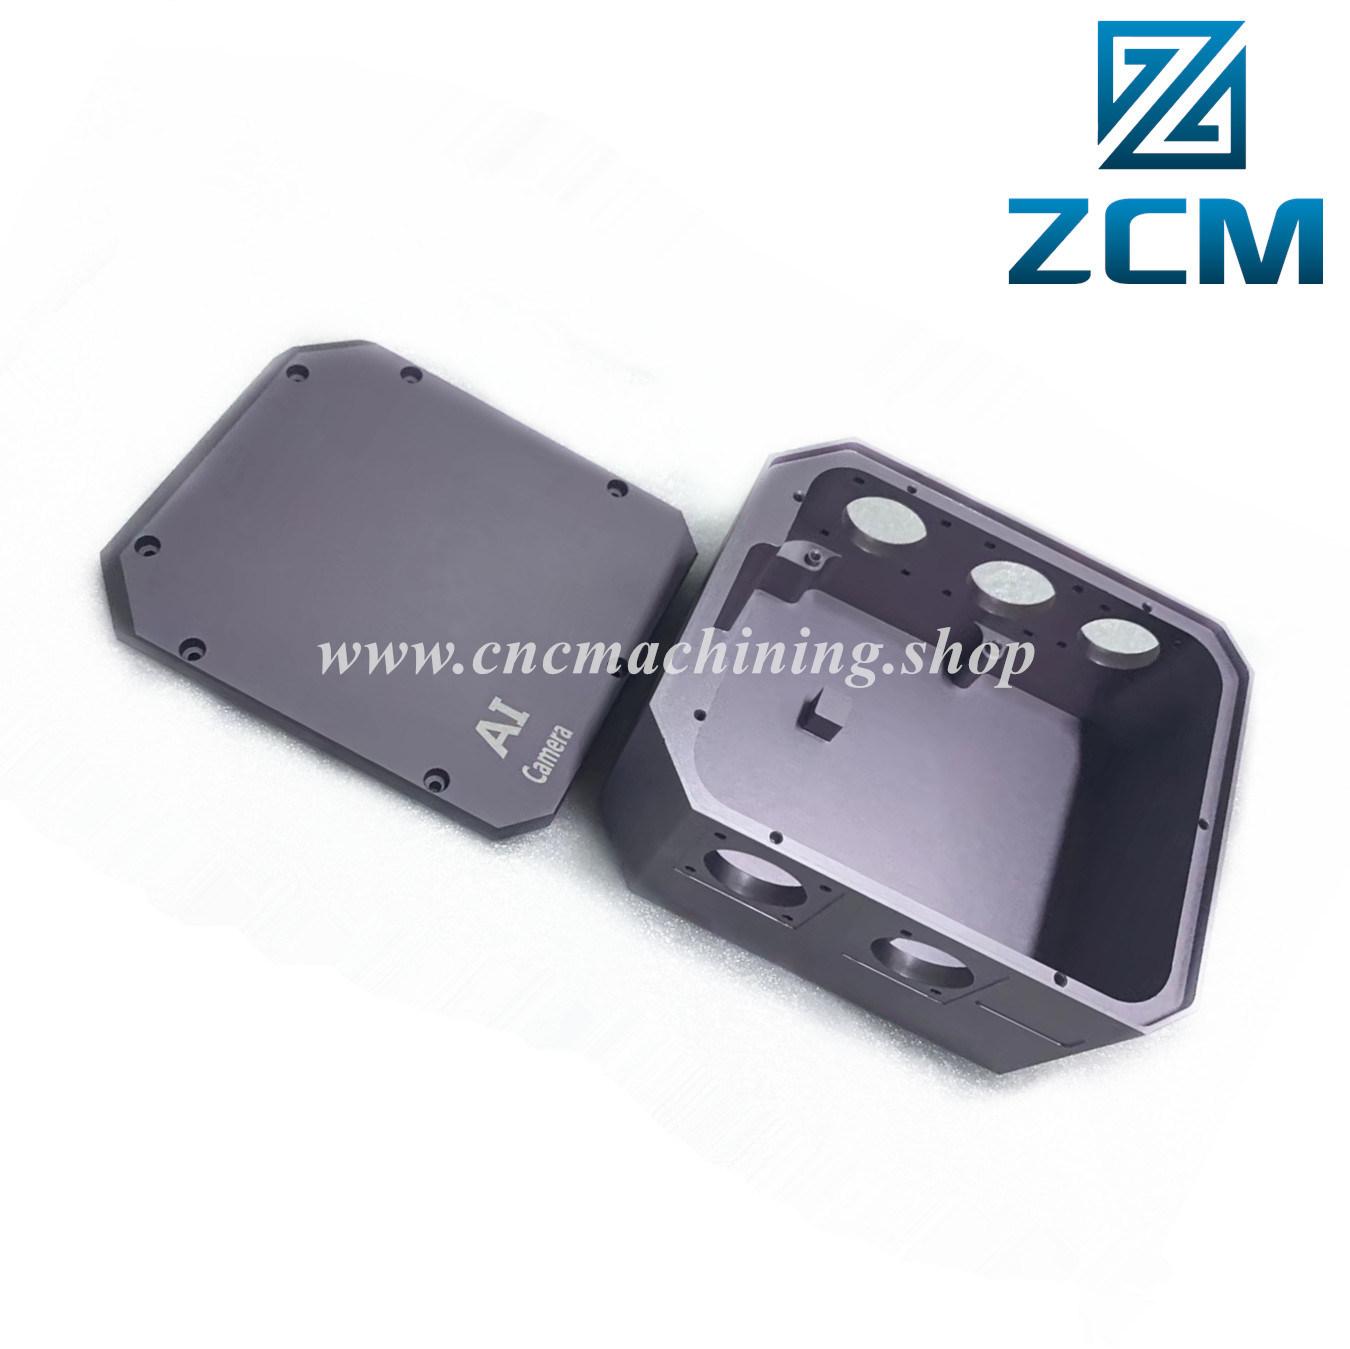 Picture of: China Shenzhen Supplier Cnc Milling Small Quantity Machining Custom Made Metal Precision Box Anodized Aluminum Camera Enclosure Ai Cctv Camera Housing China Cnc Machining Parts Cnc Parts